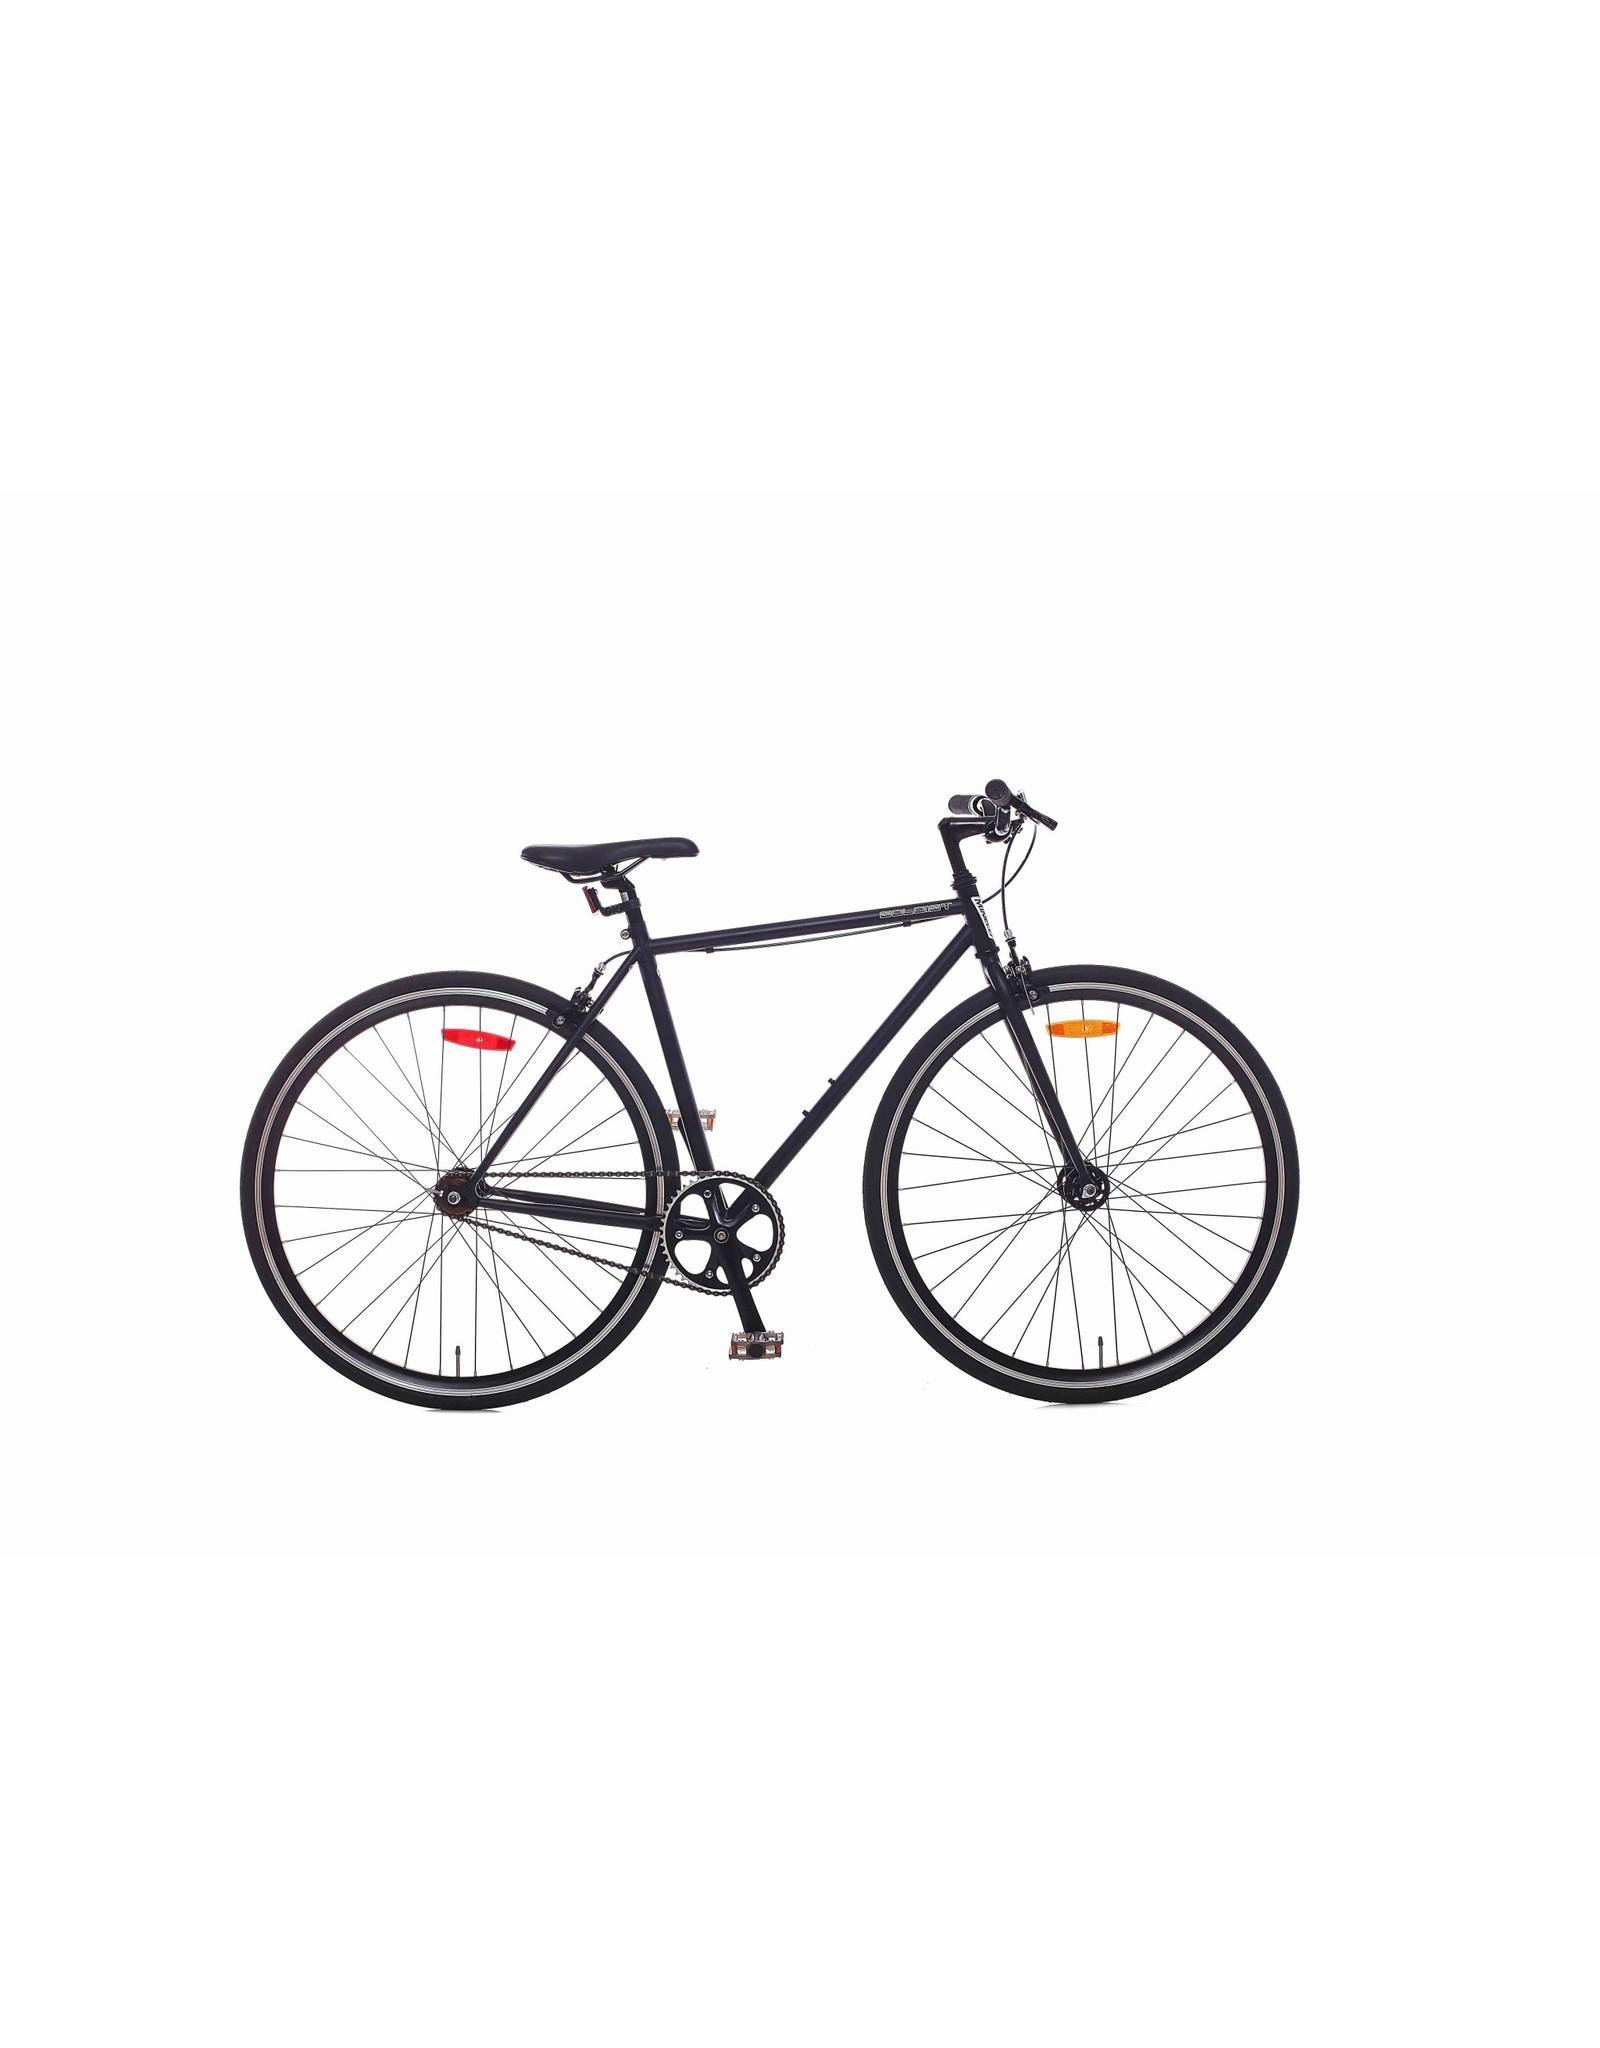 Minelli Fixie Bike / Single Speed - MINELLI Soloist Black